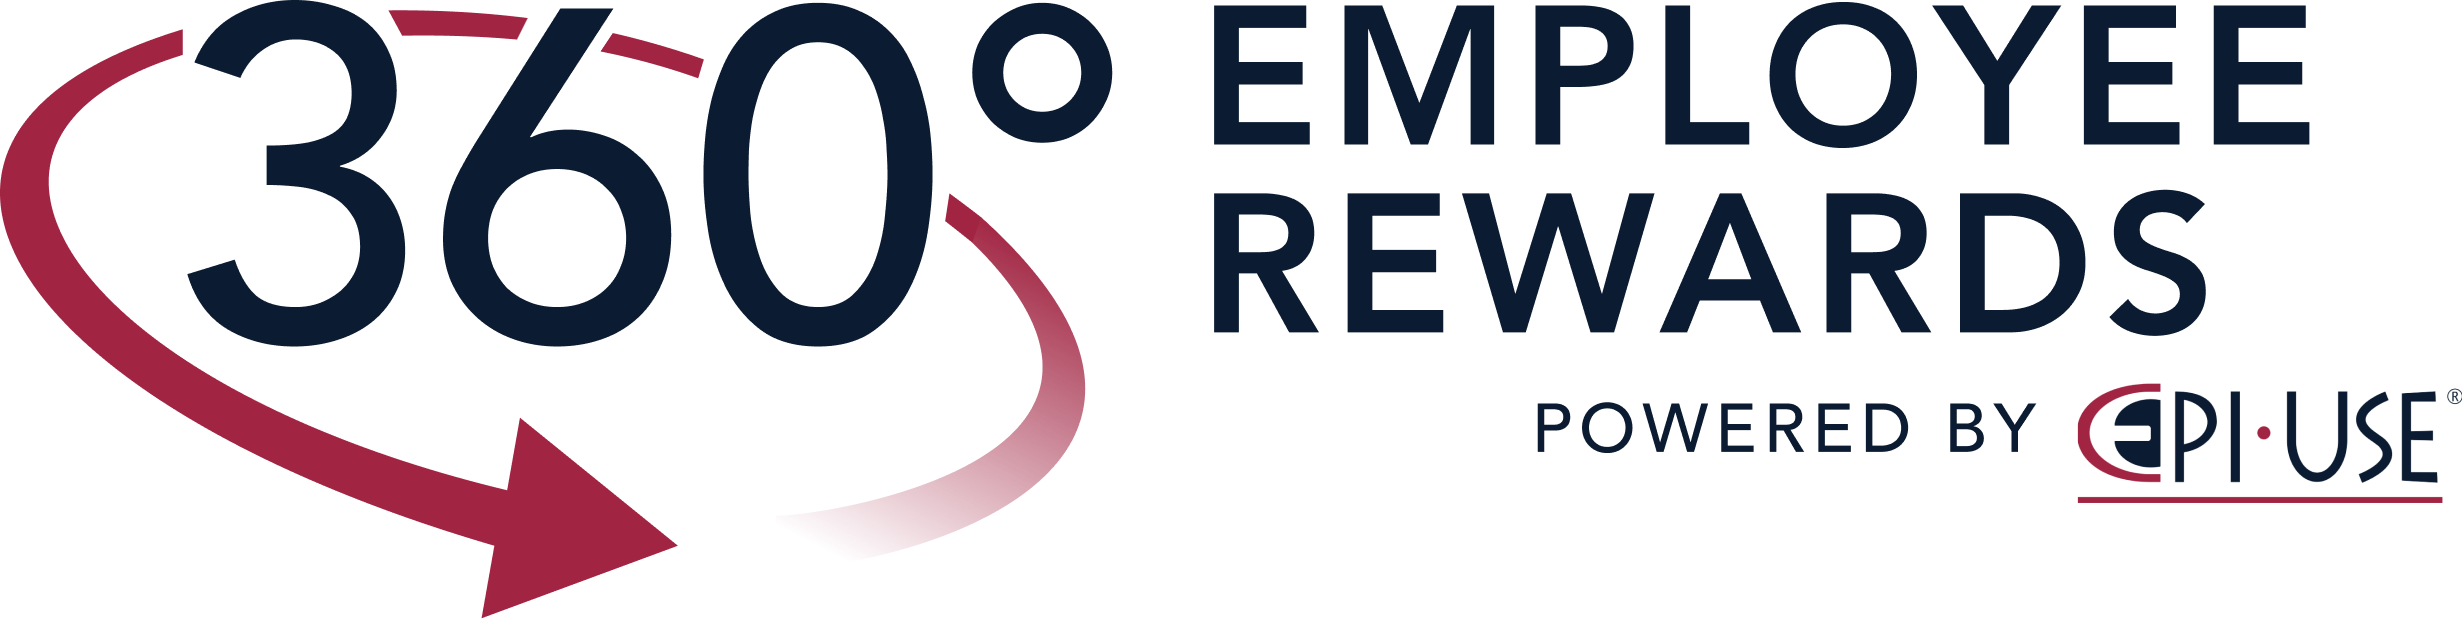 Employee Rewards Platform provides self-service access to reward details